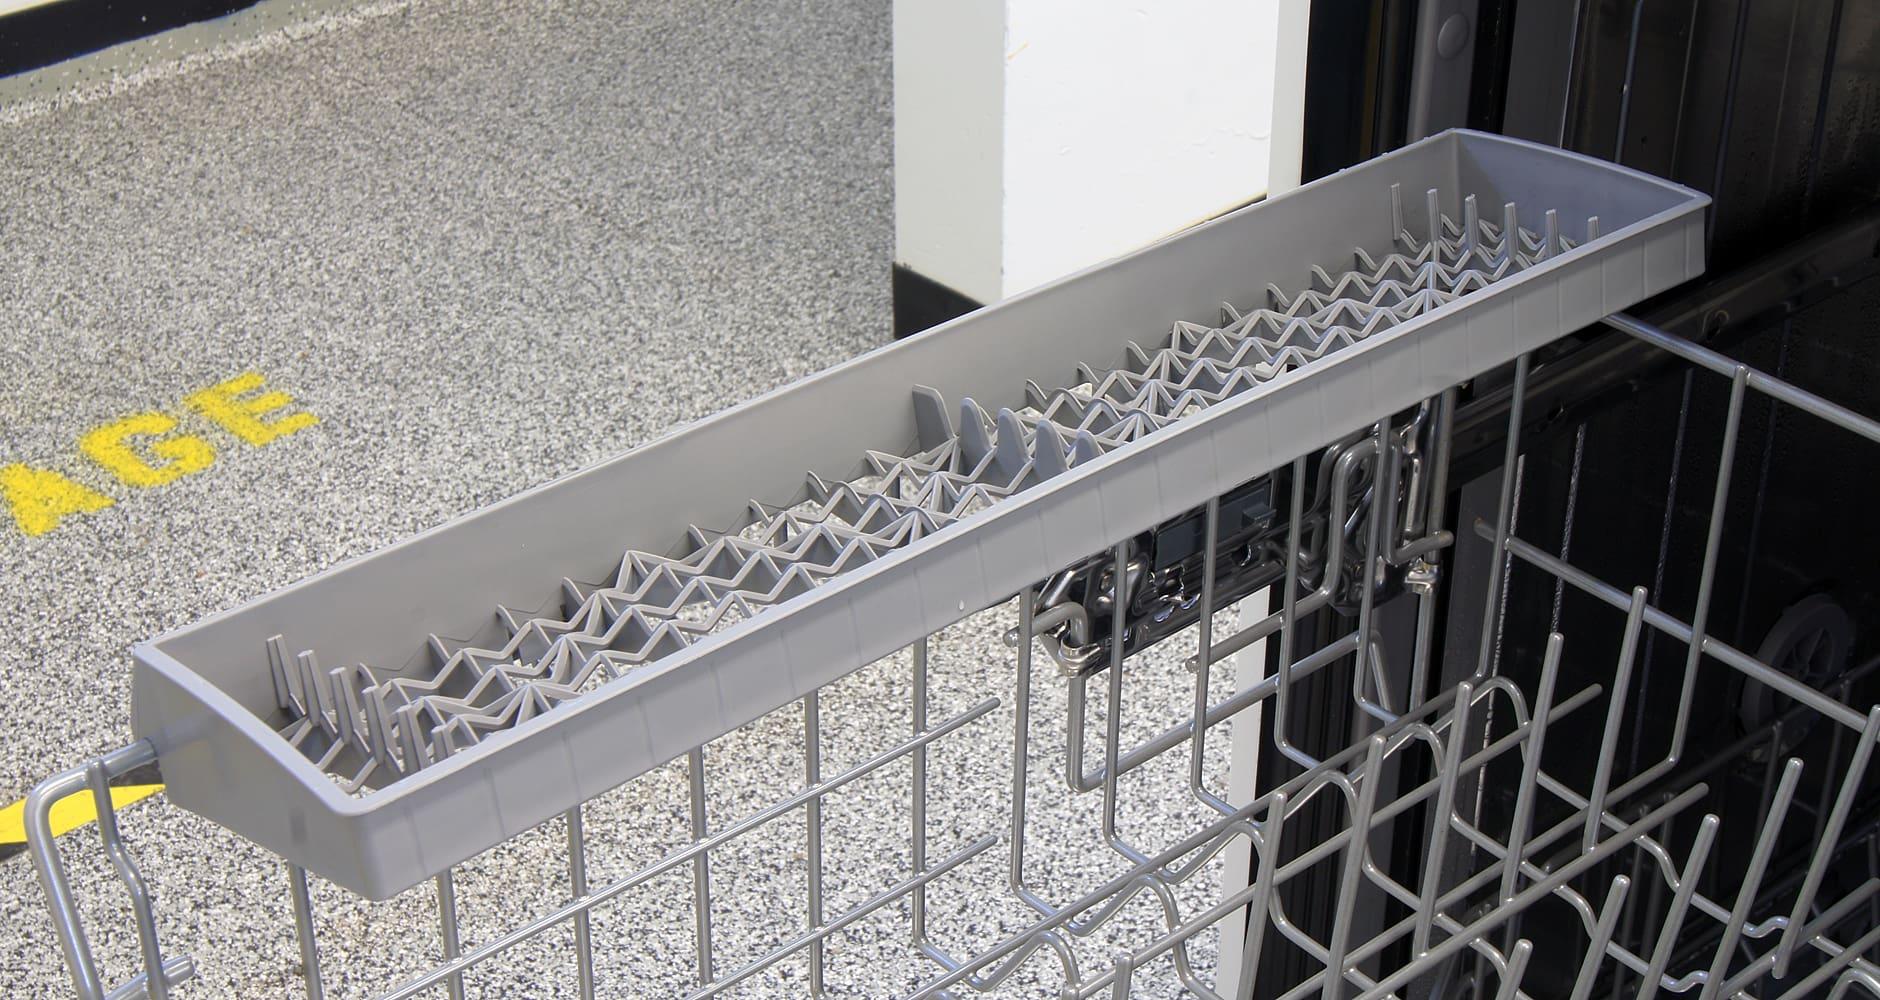 Bosch SHX4AT75UC silverware tray